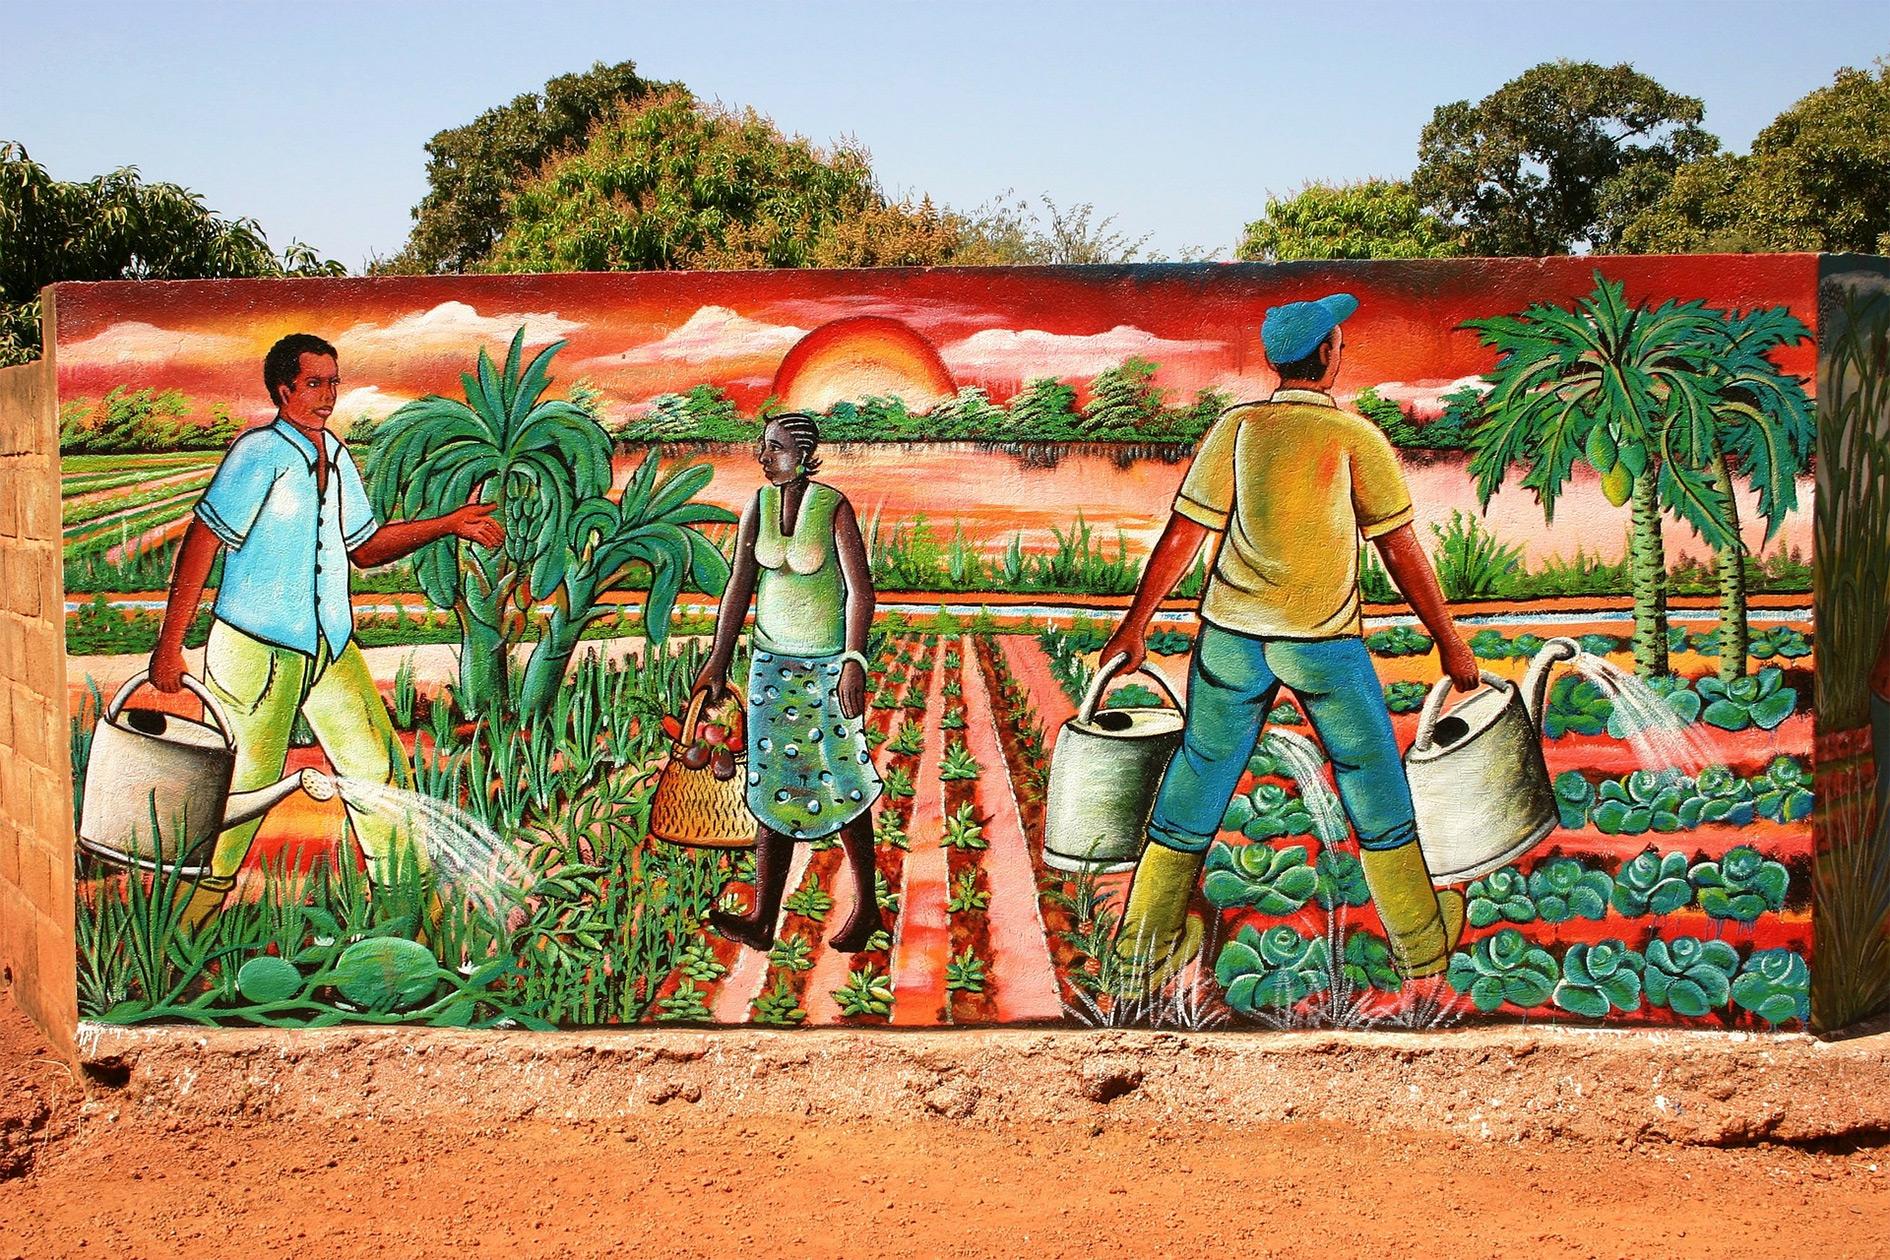 Burkina Faso mural.